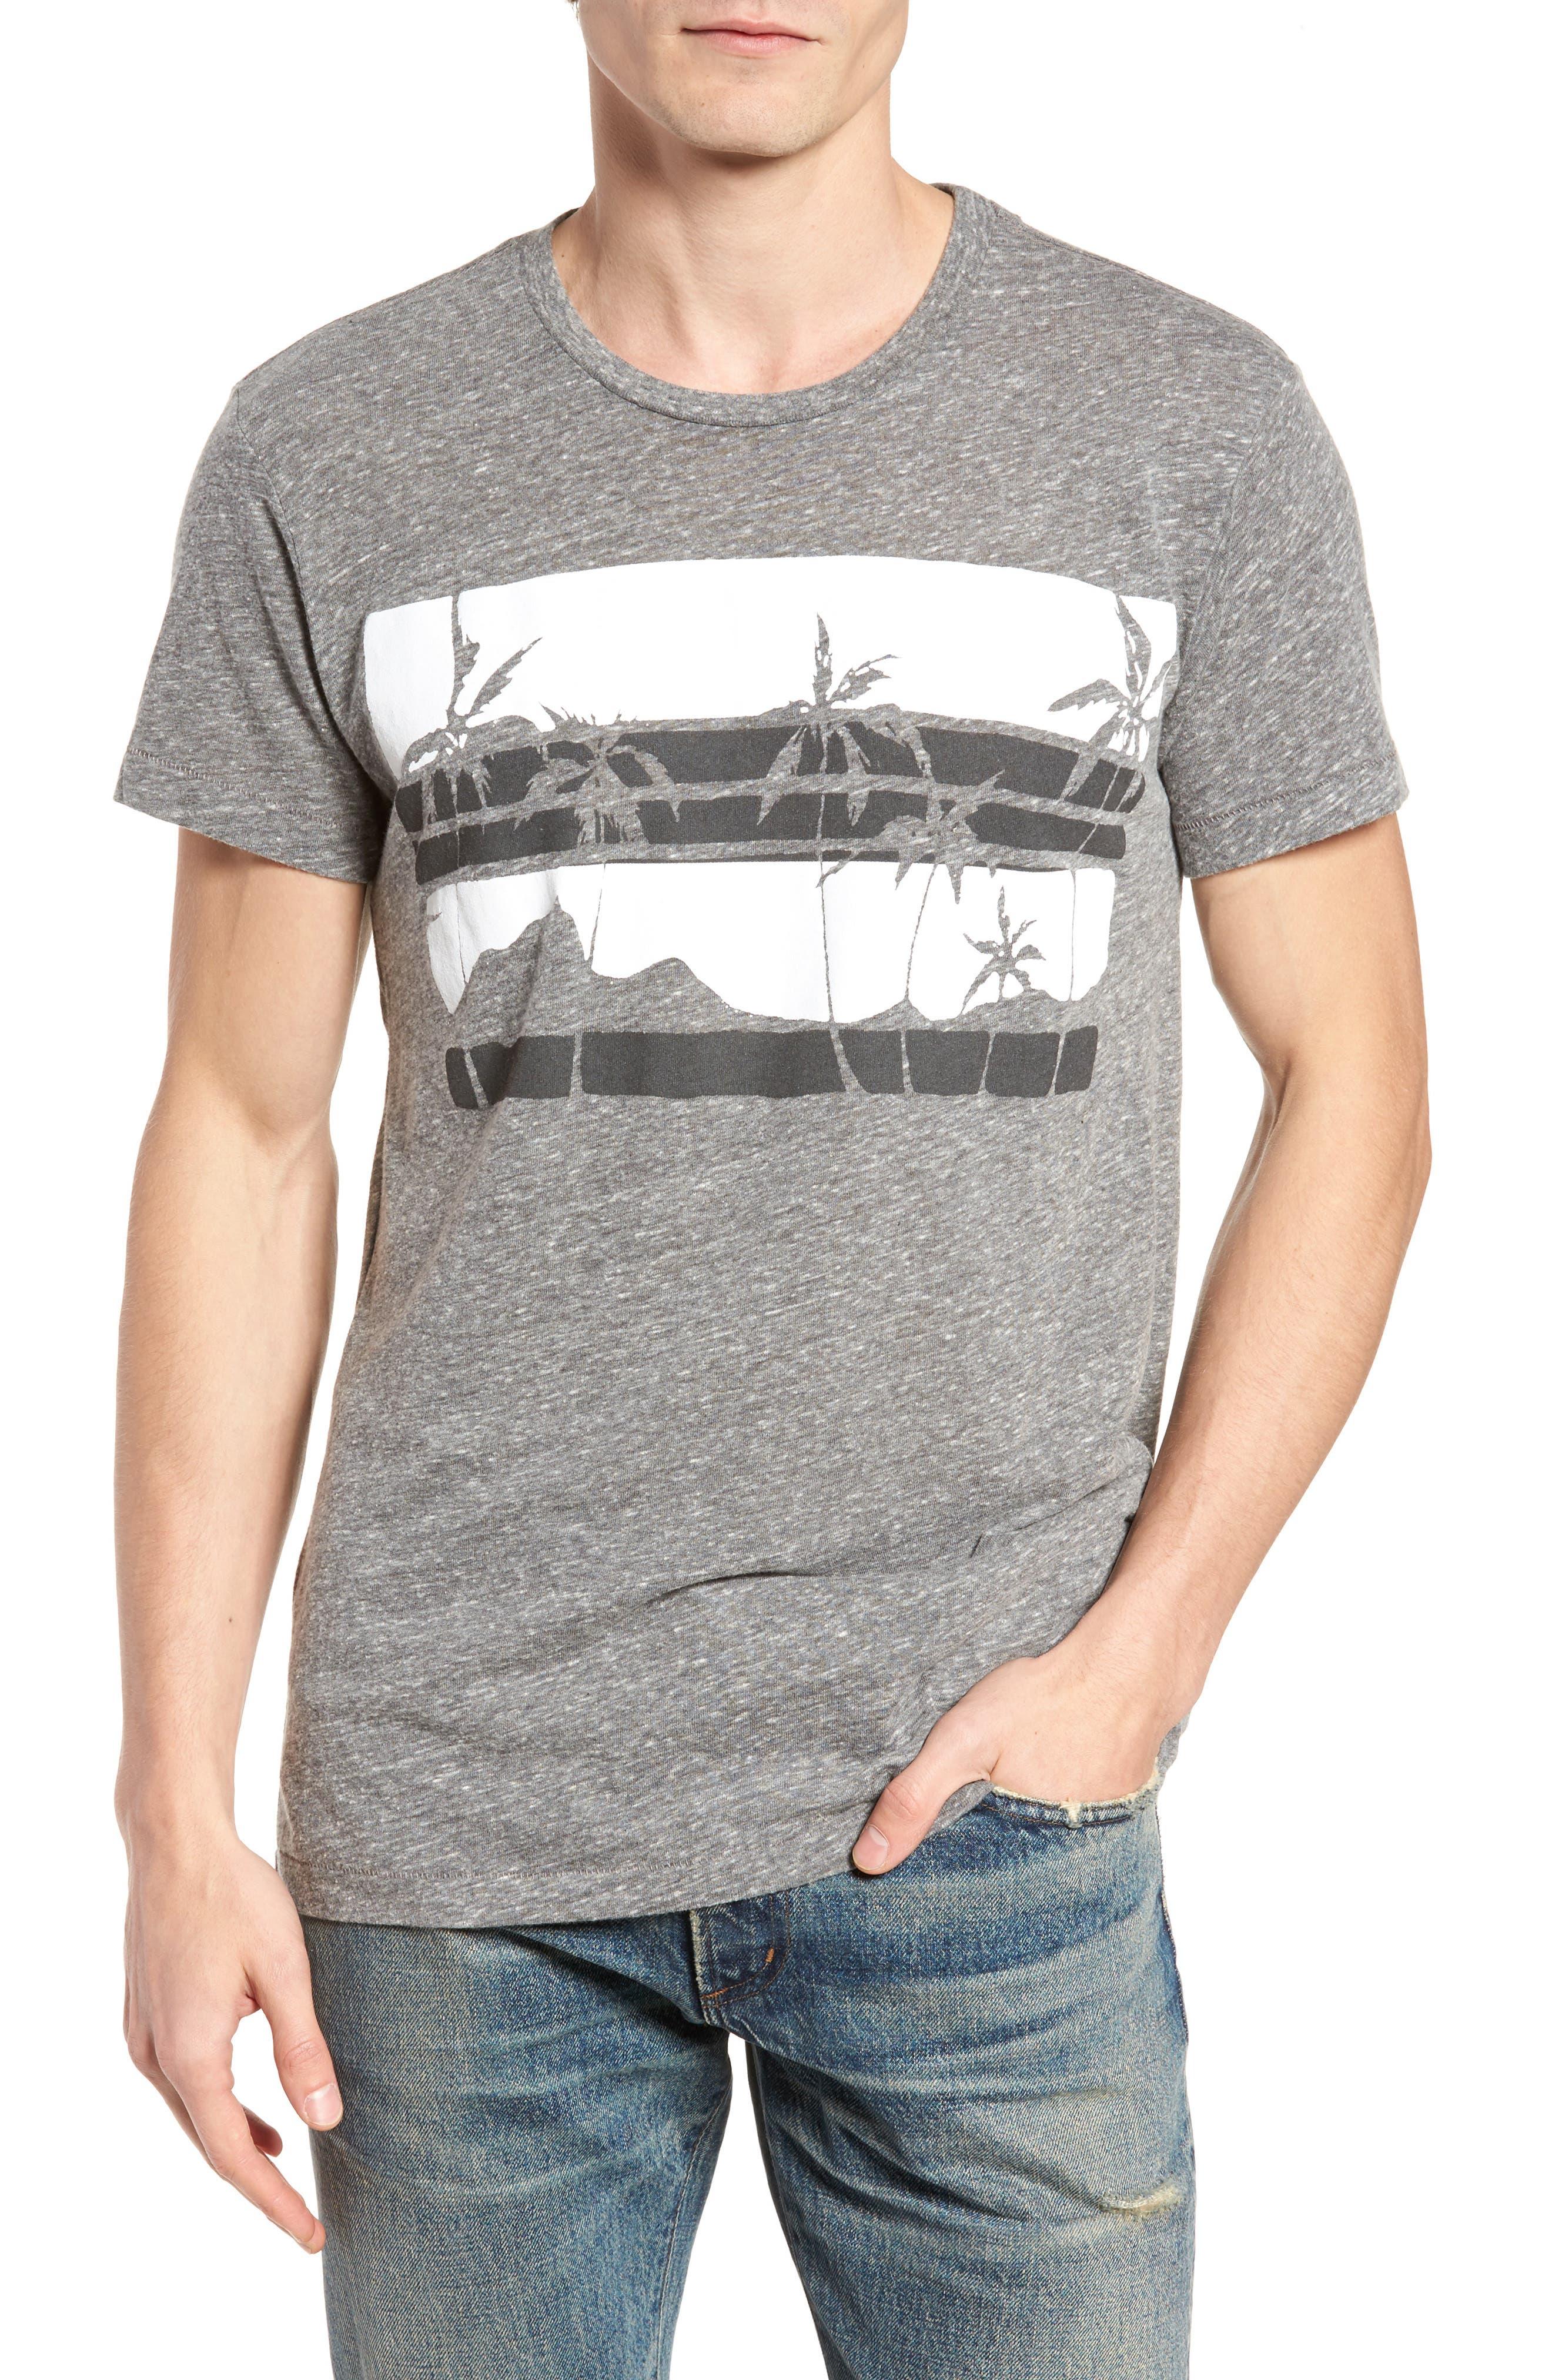 Las Palmas T-Shirt,                         Main,                         color, 060